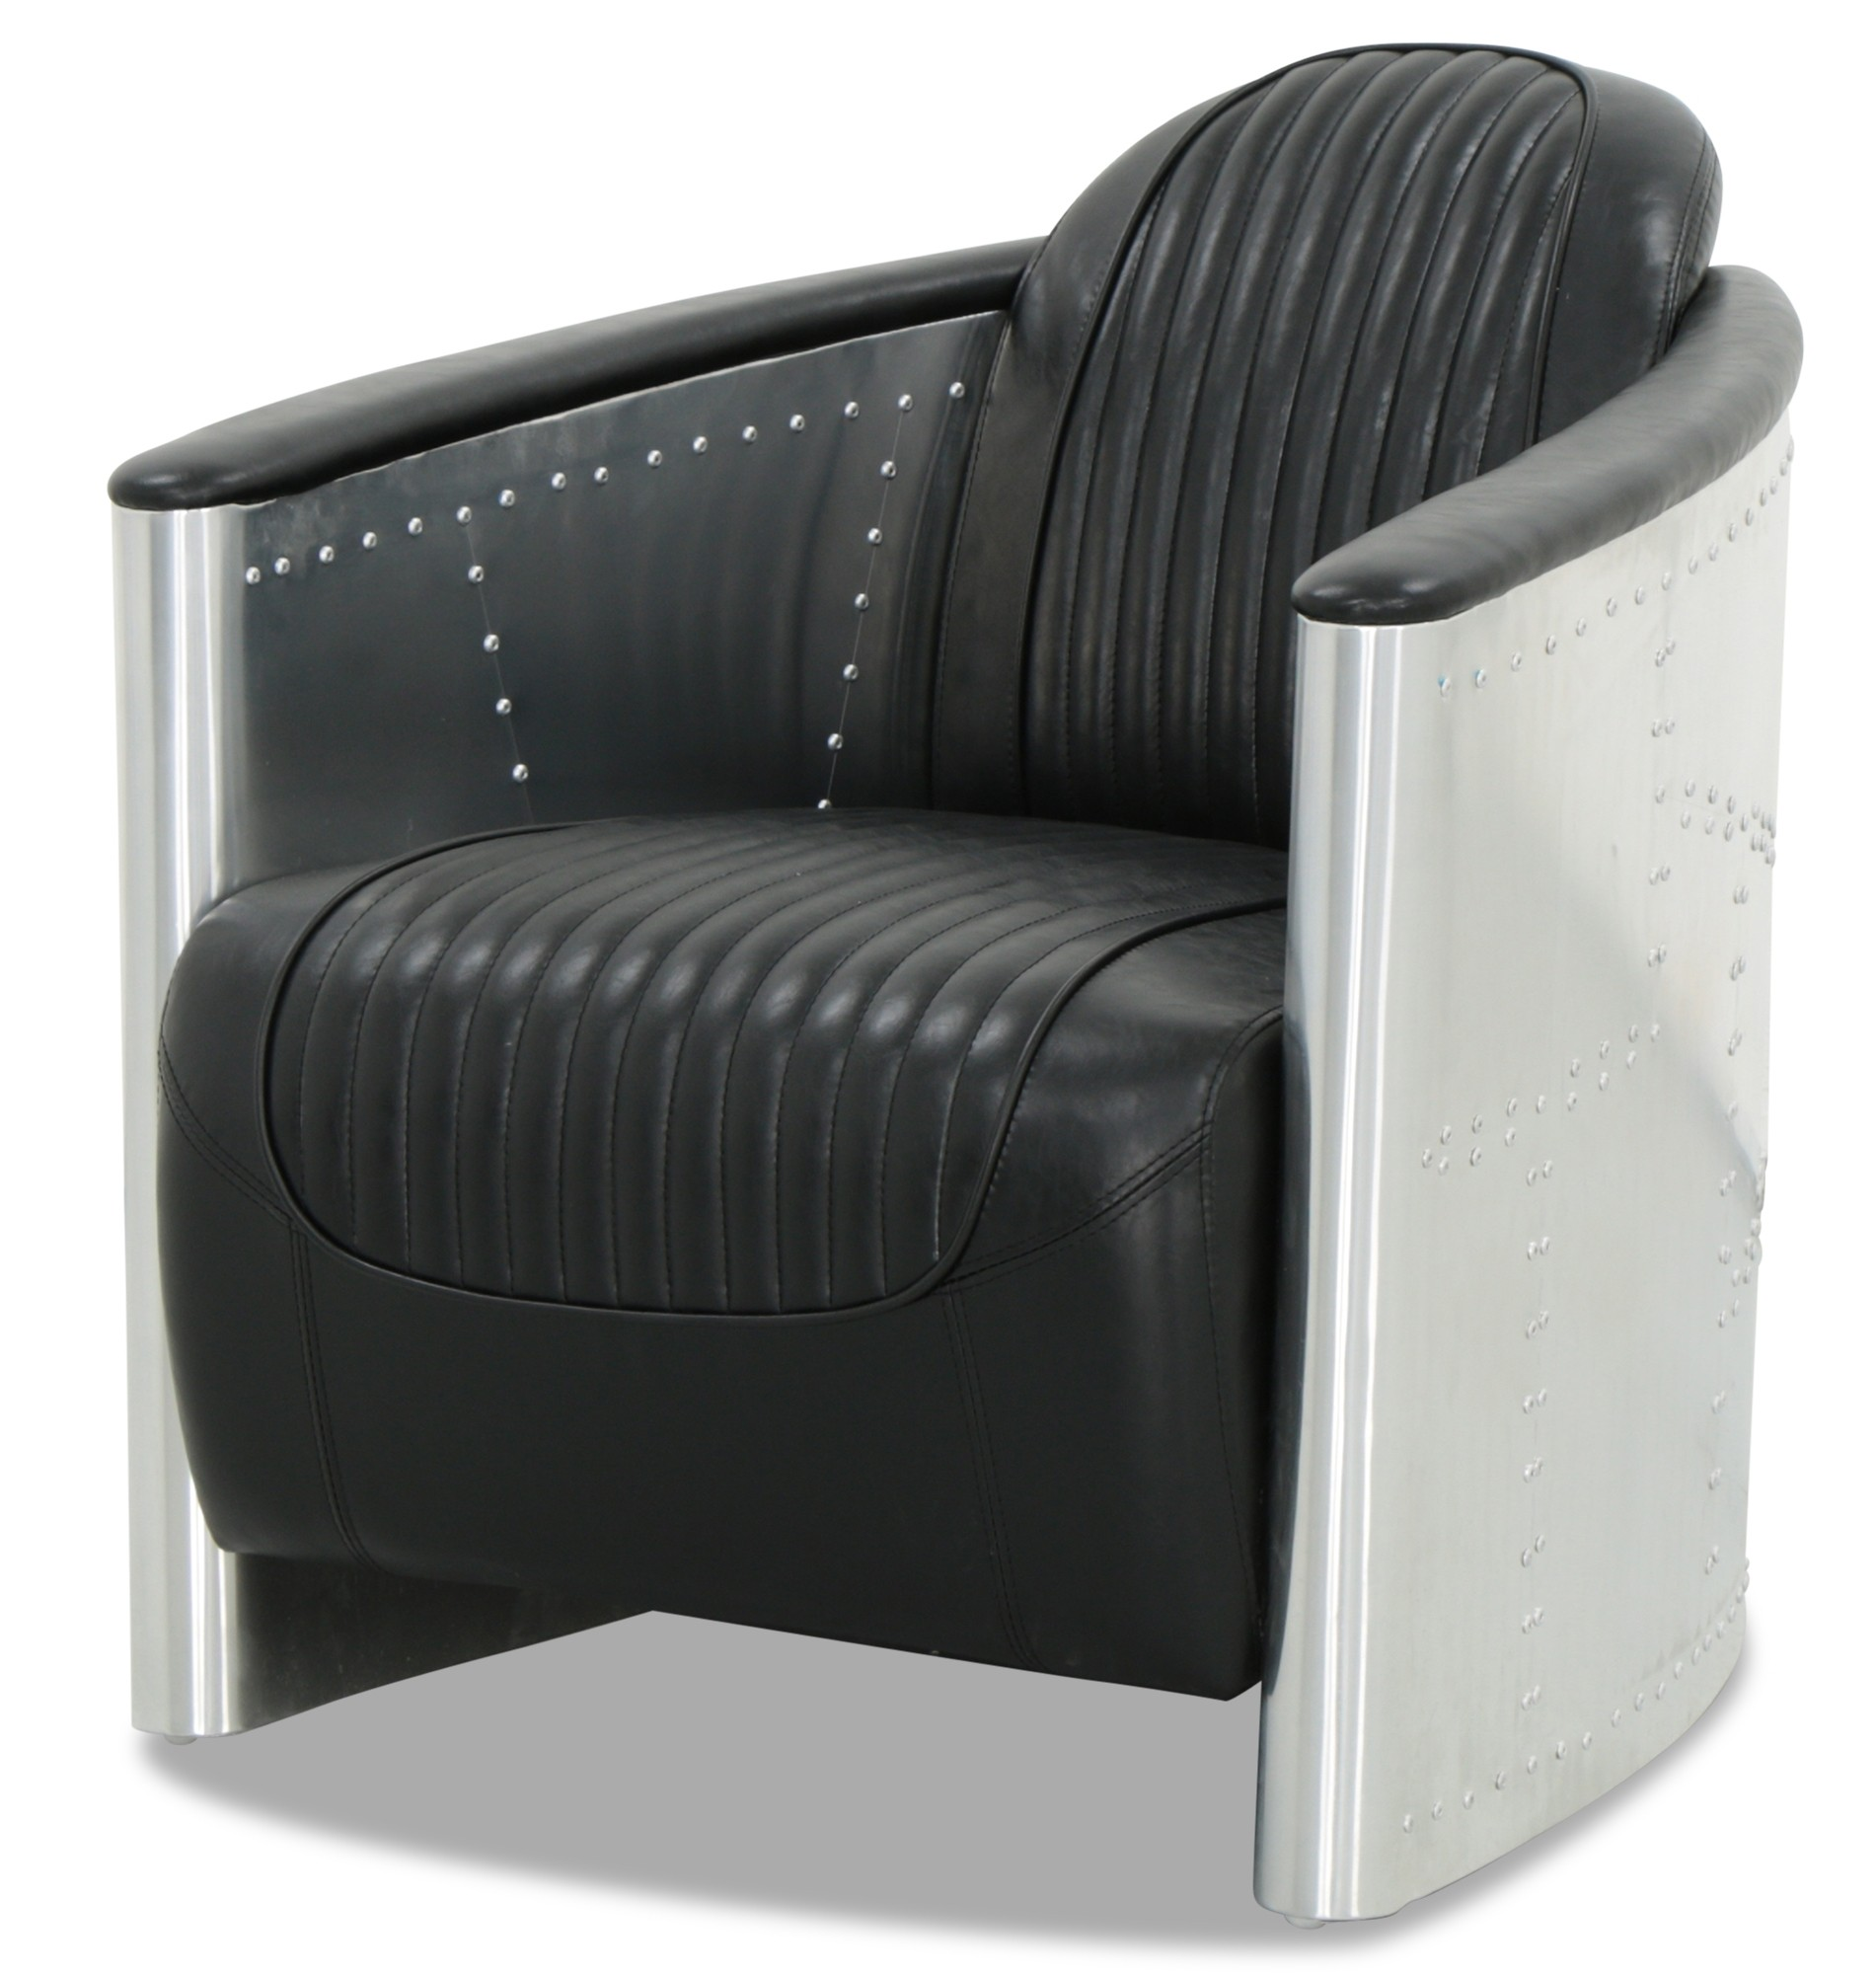 aviator chair replica genuine leather recliner chairs designer arm in black pu